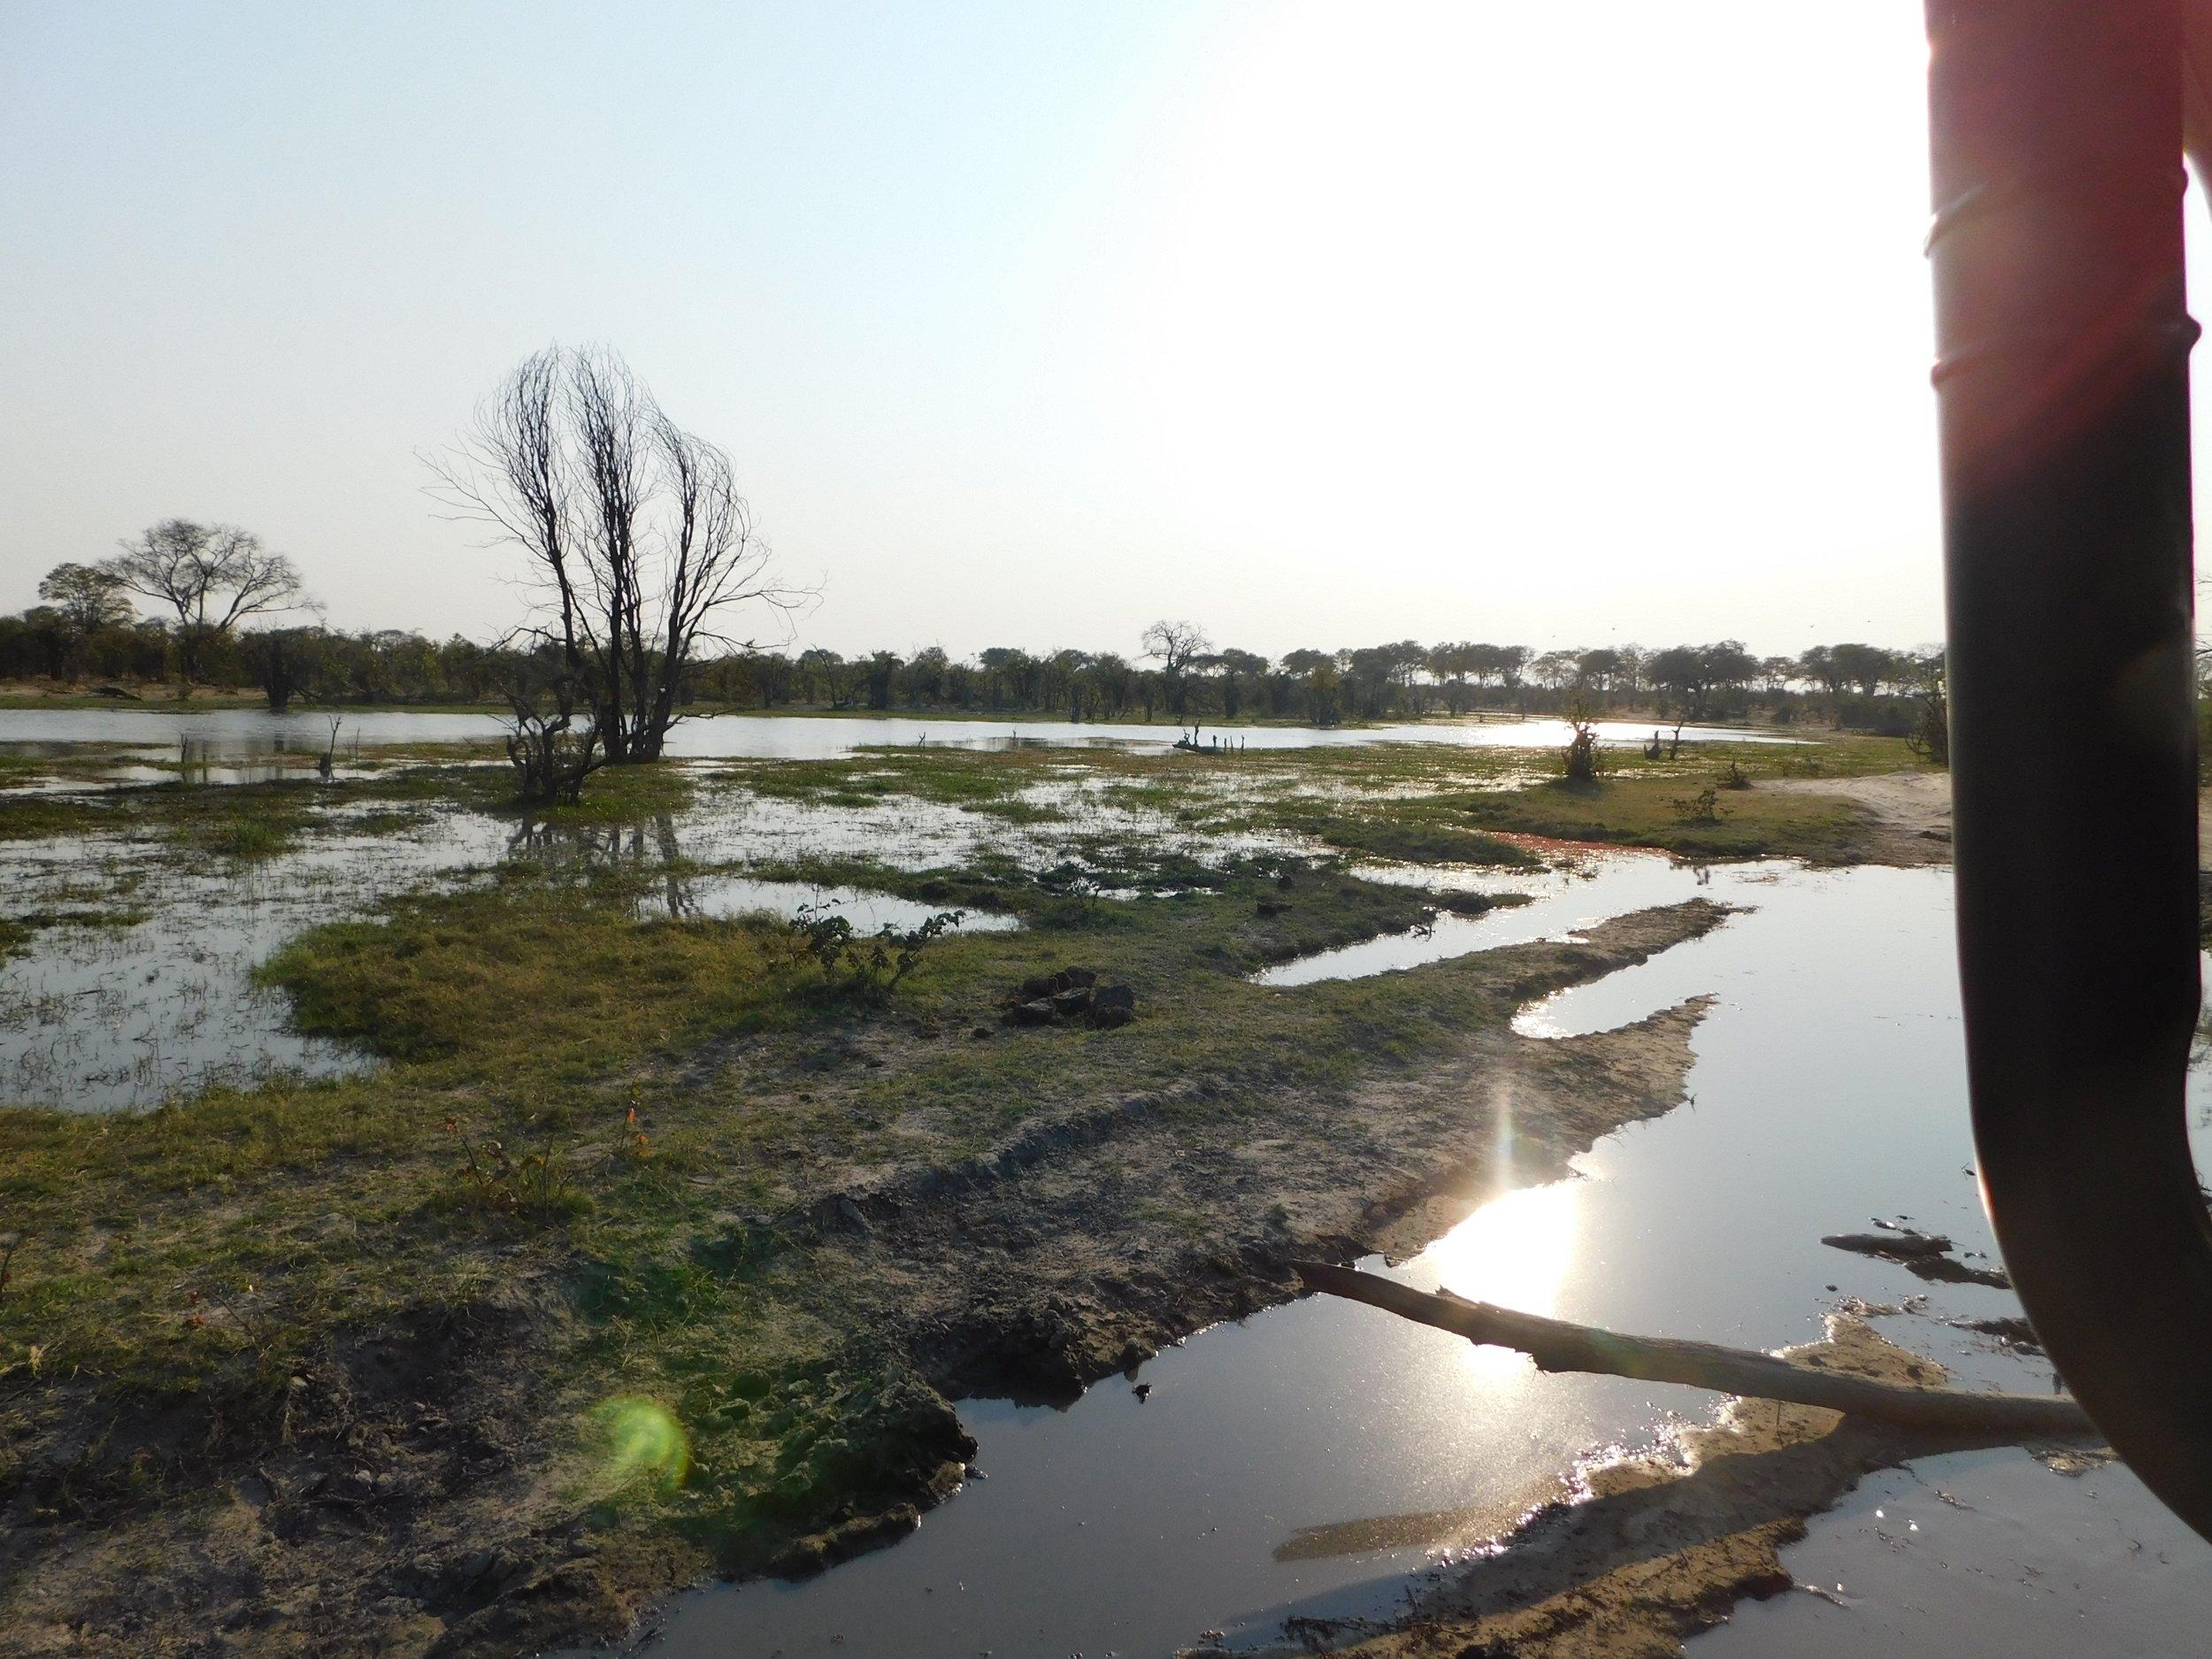 The sun hitting the water at the start of the Okavango Delta.